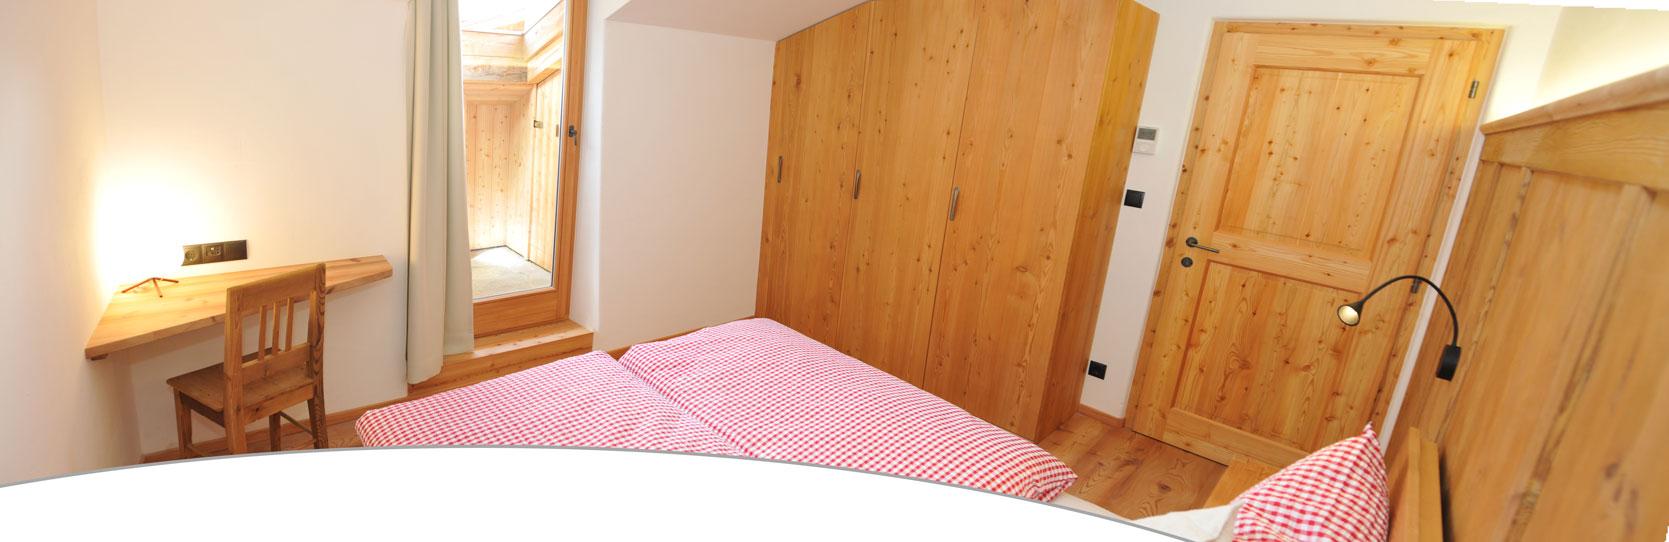 App. Schönberg -slaapkamer